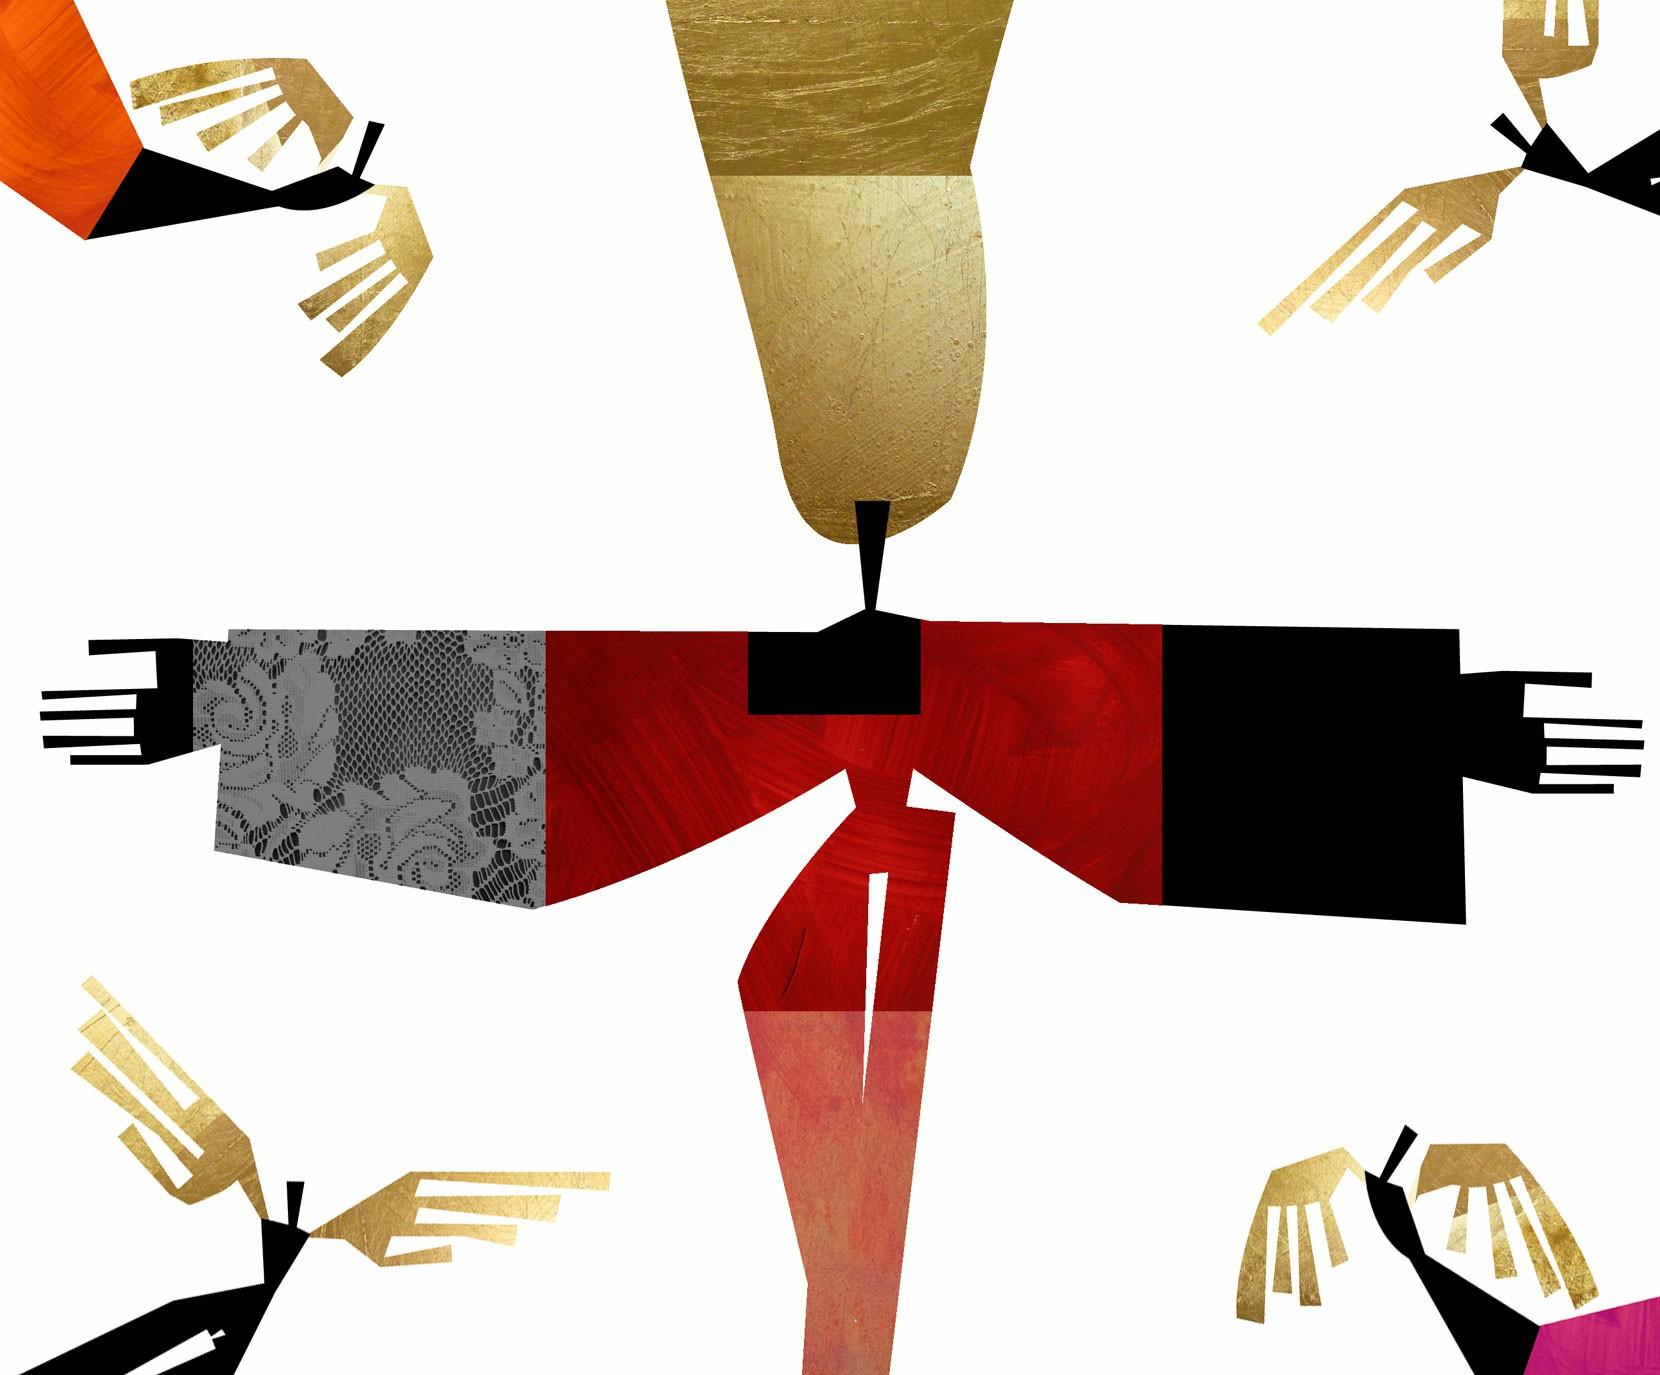 The-Uncertain-Testament-Concept-project-idea